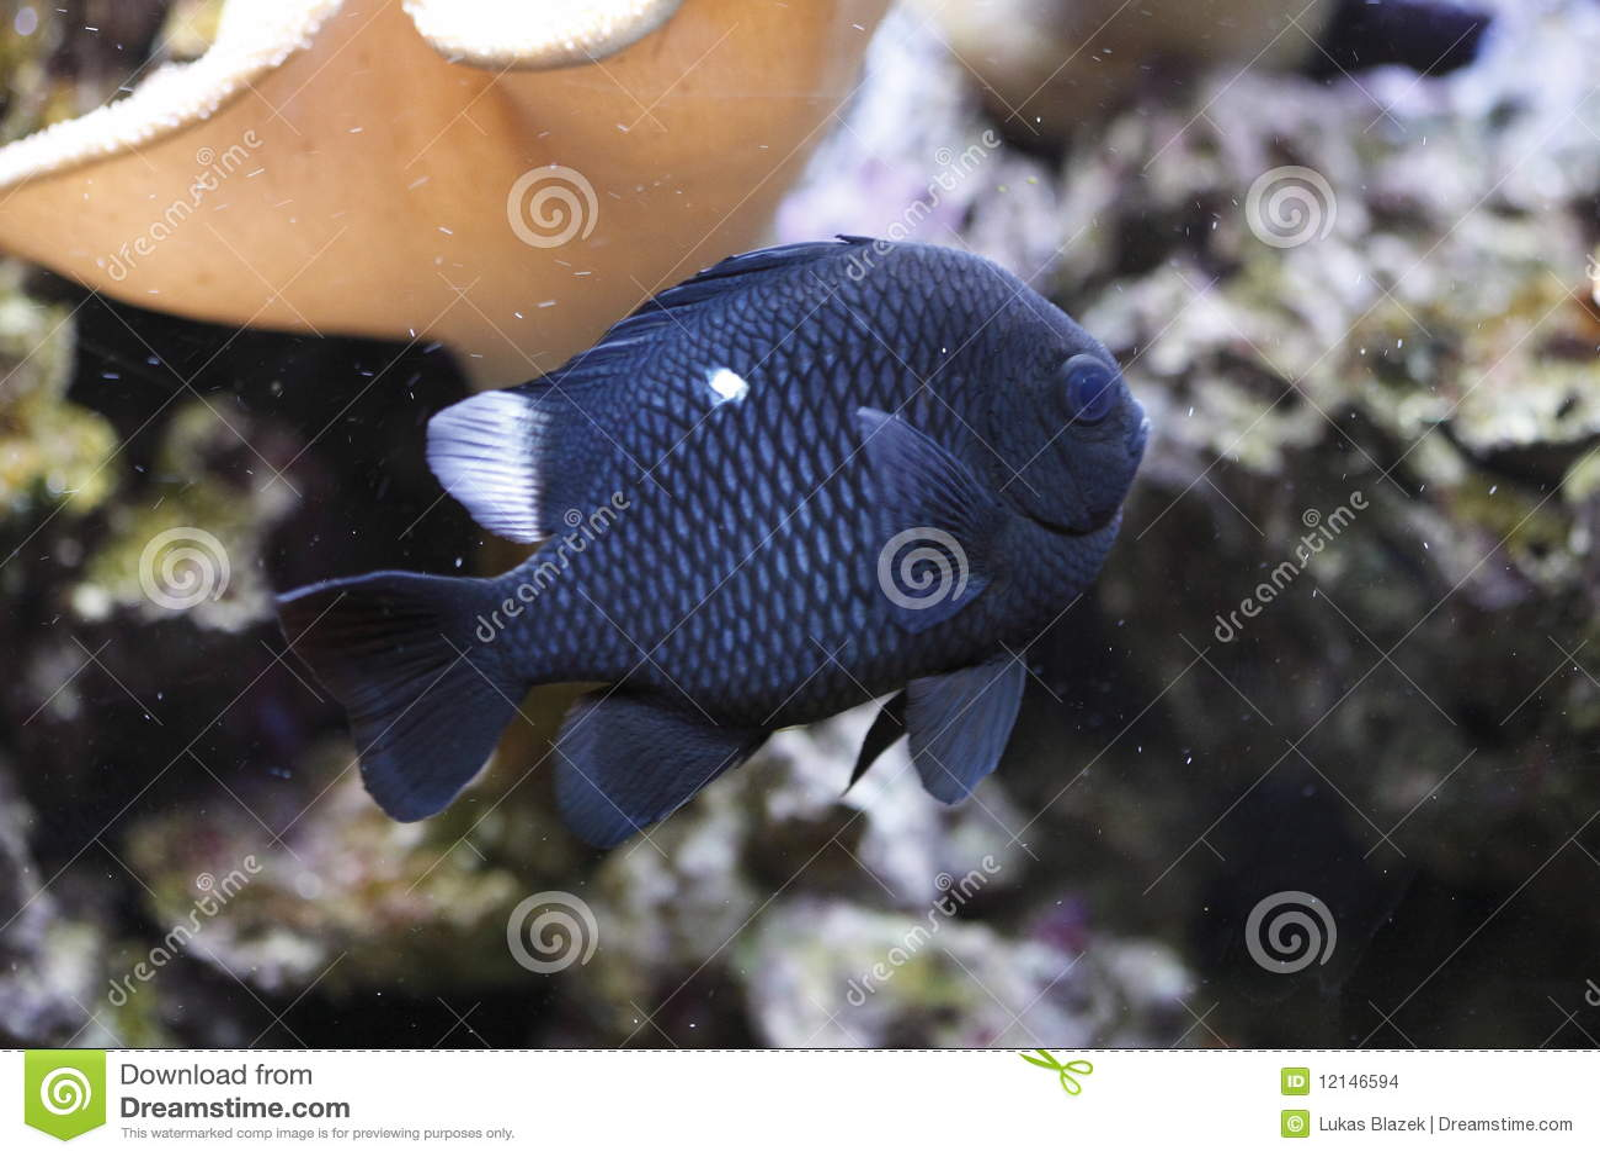 Three spot damselfish - photo#20